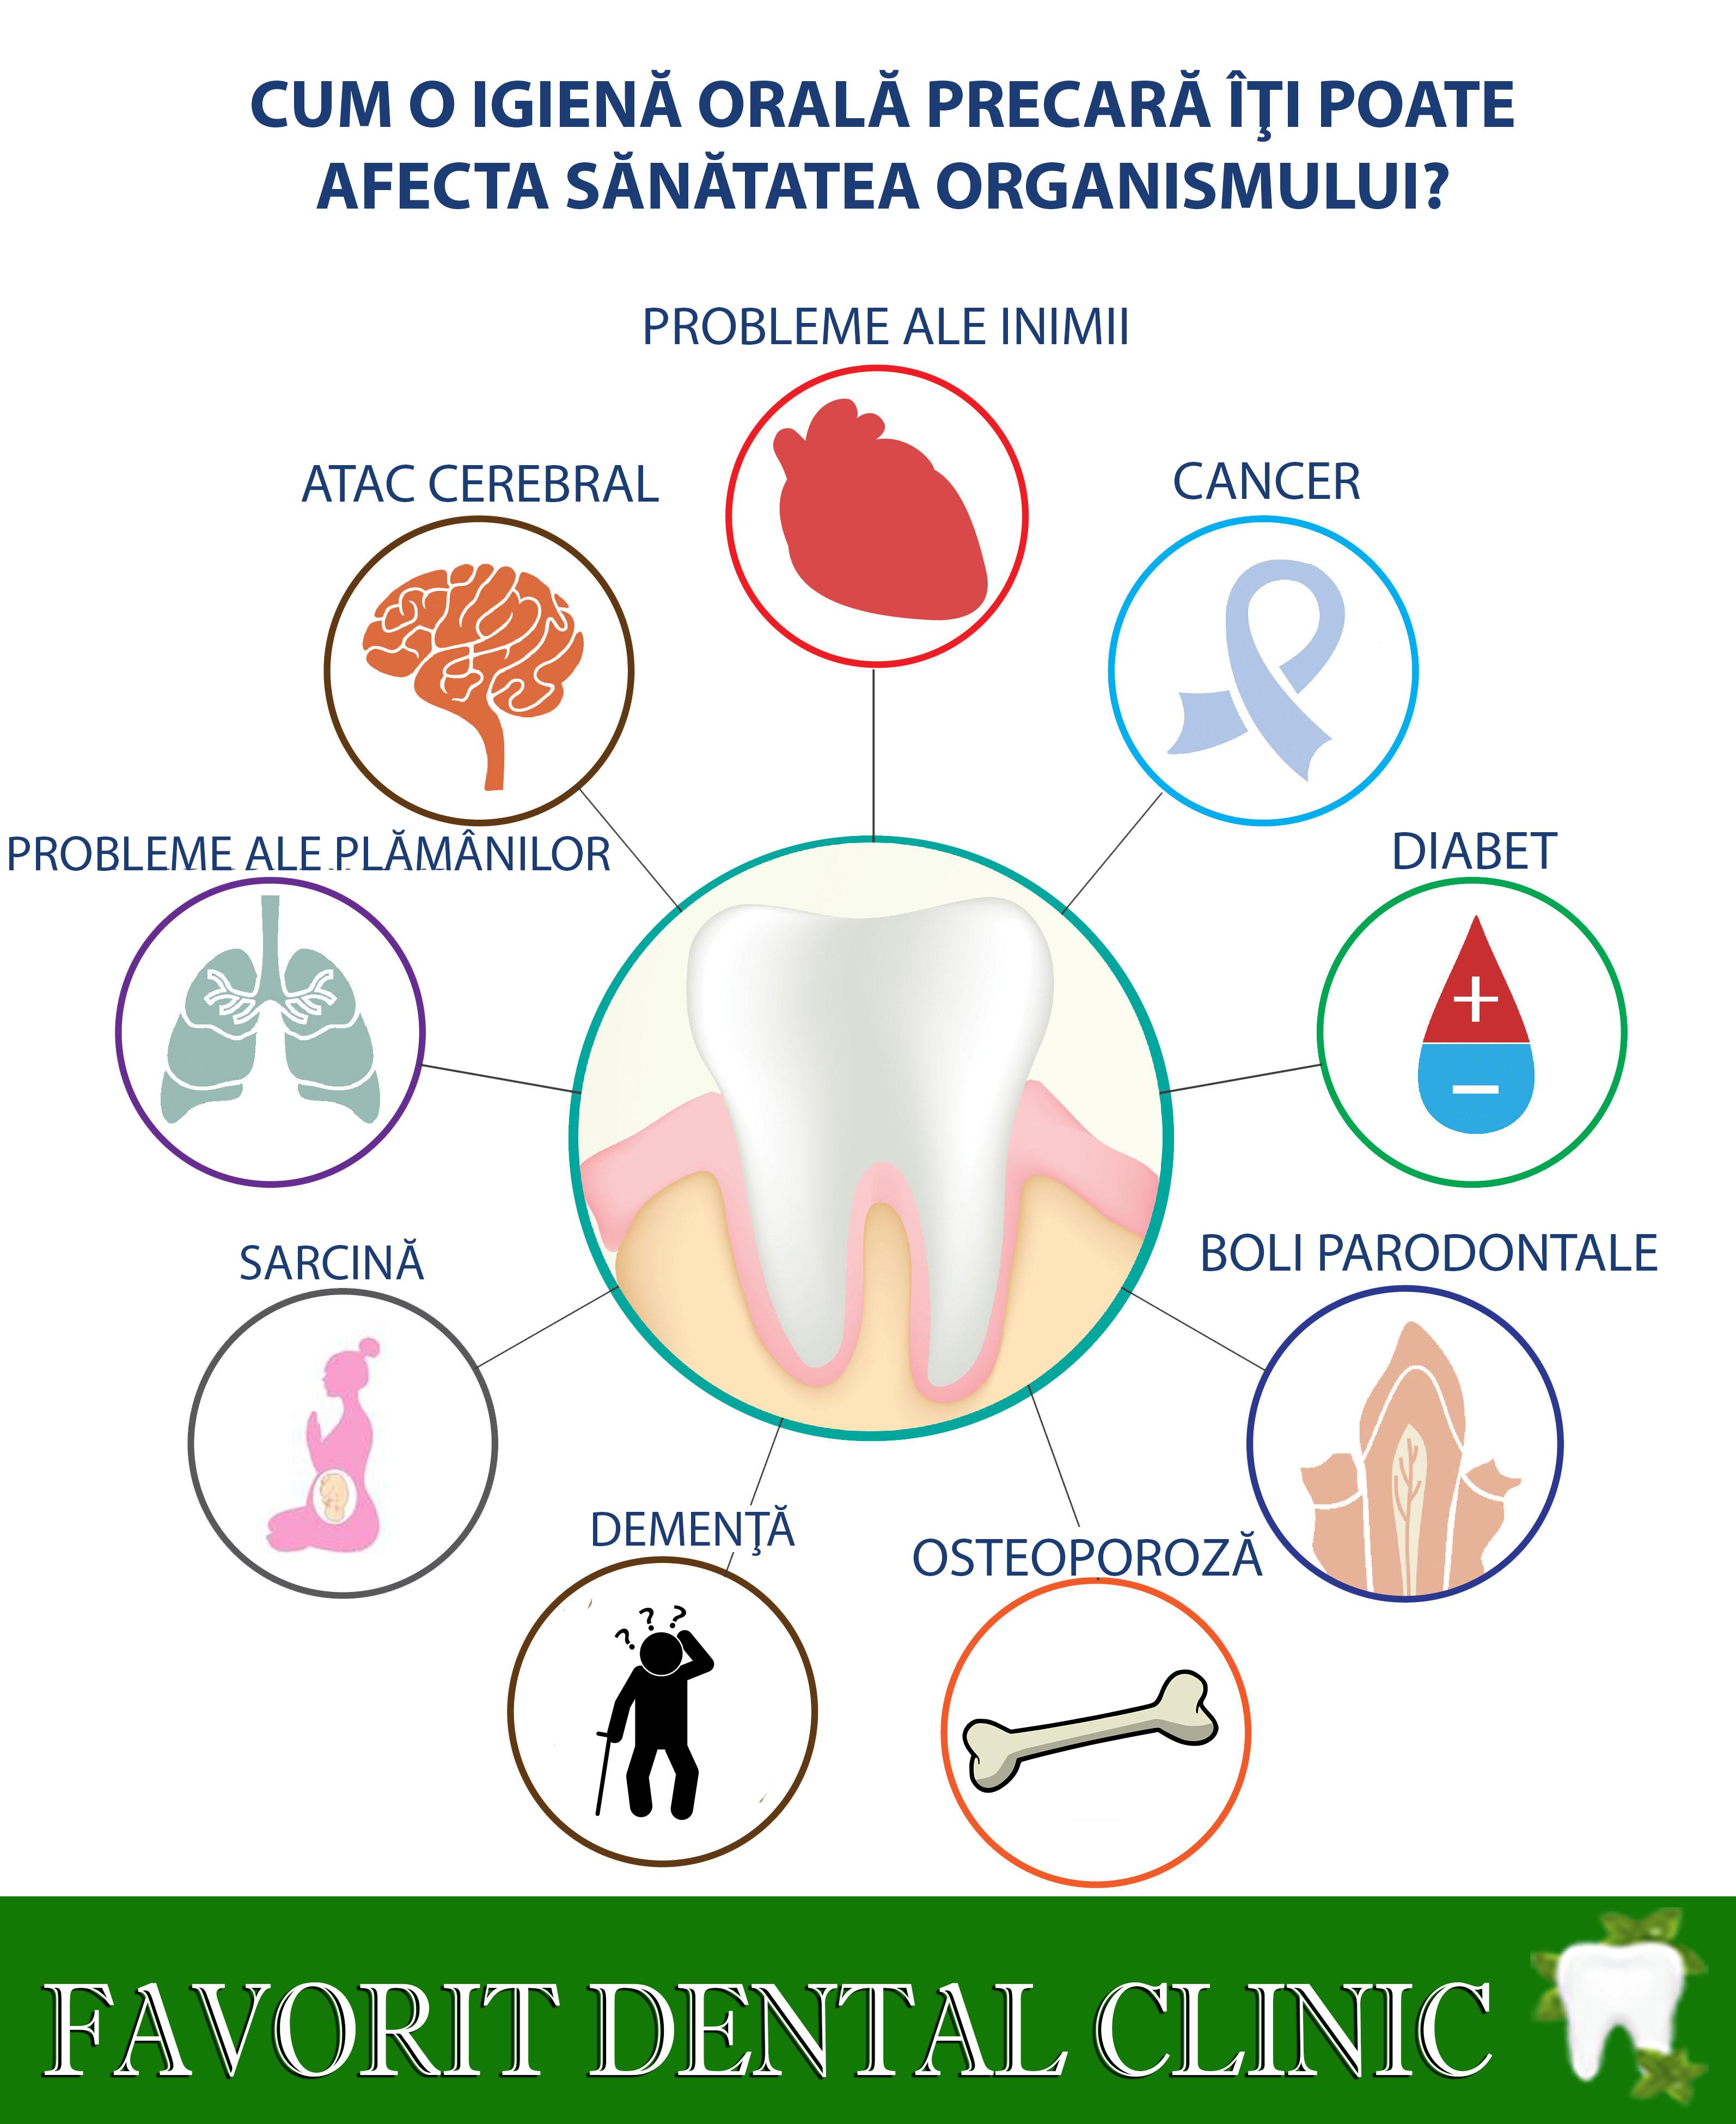 Cum influenteaza sanatatea orala imunitatea organismului